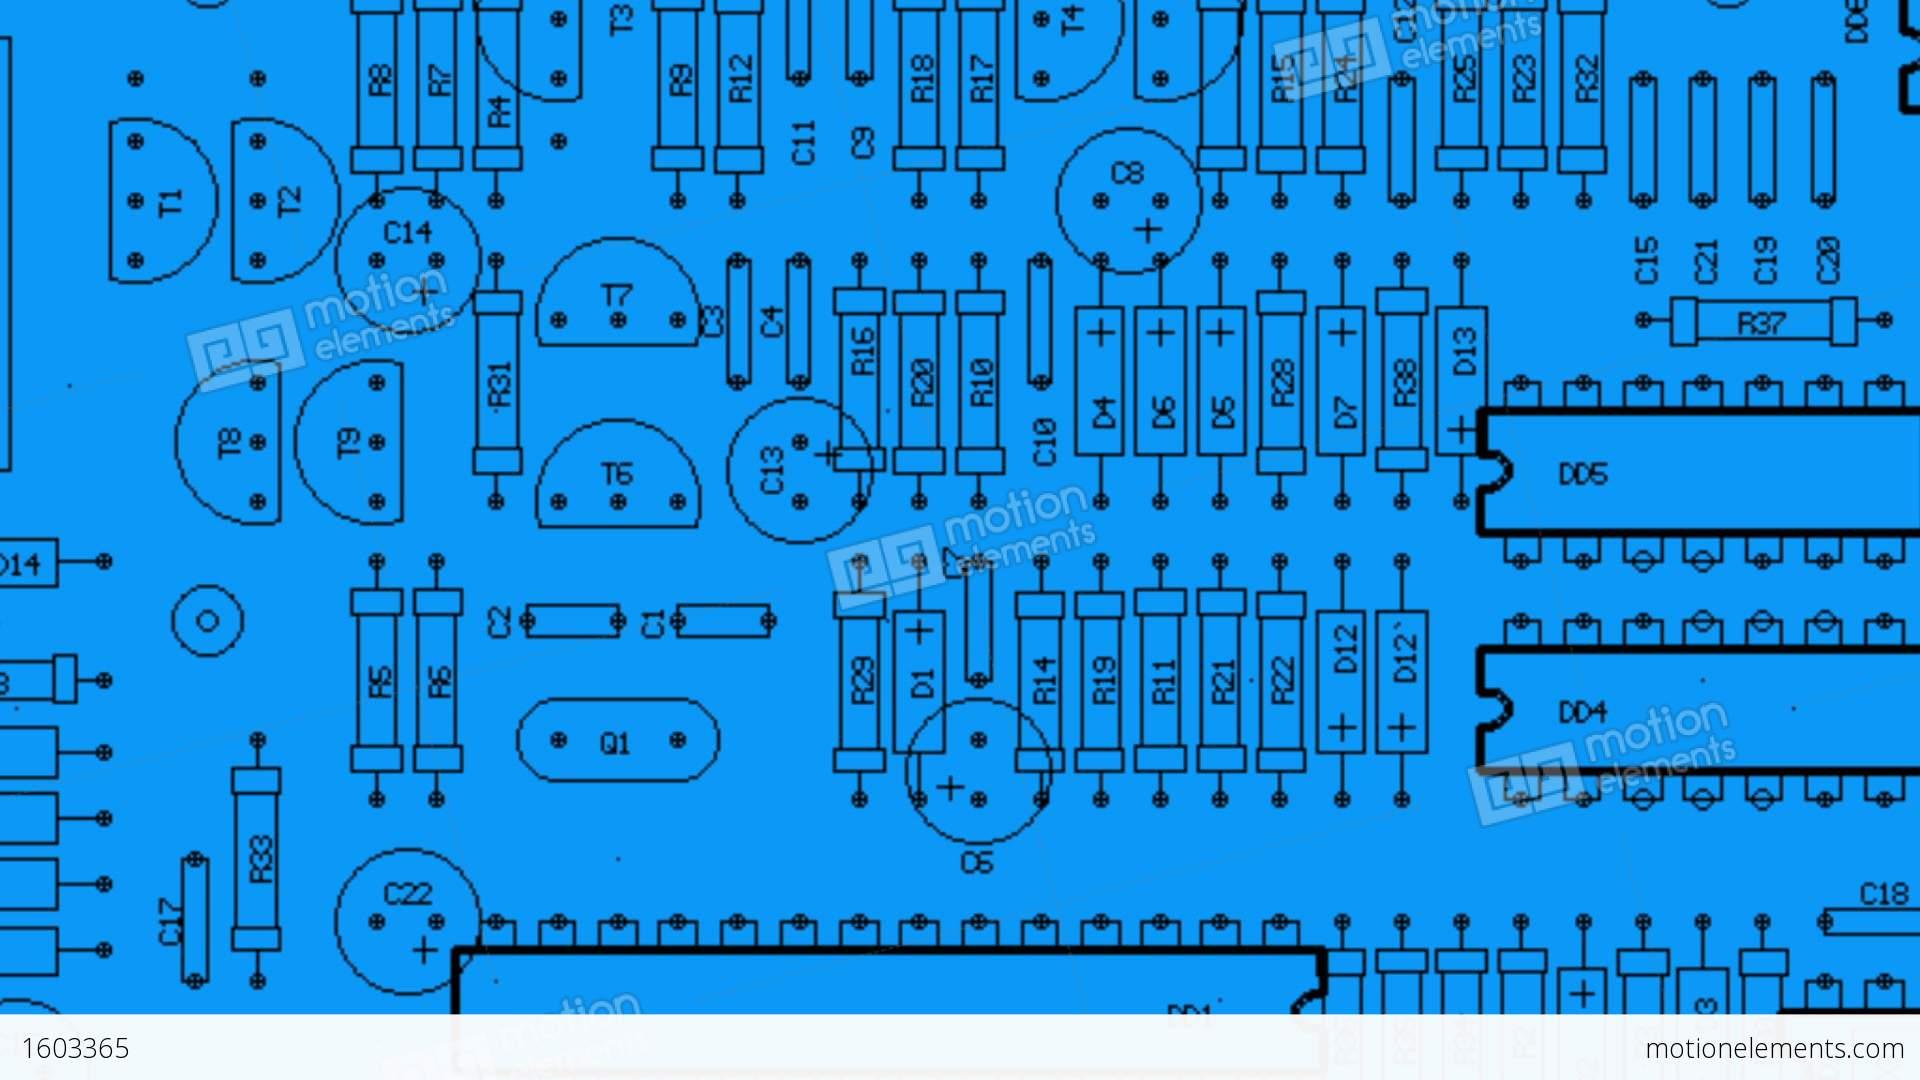 Printed Circuit Board Company Faq Advanced Circuits Pcb Pcba Segway Buy Ciruit Transistor 101sciencecom